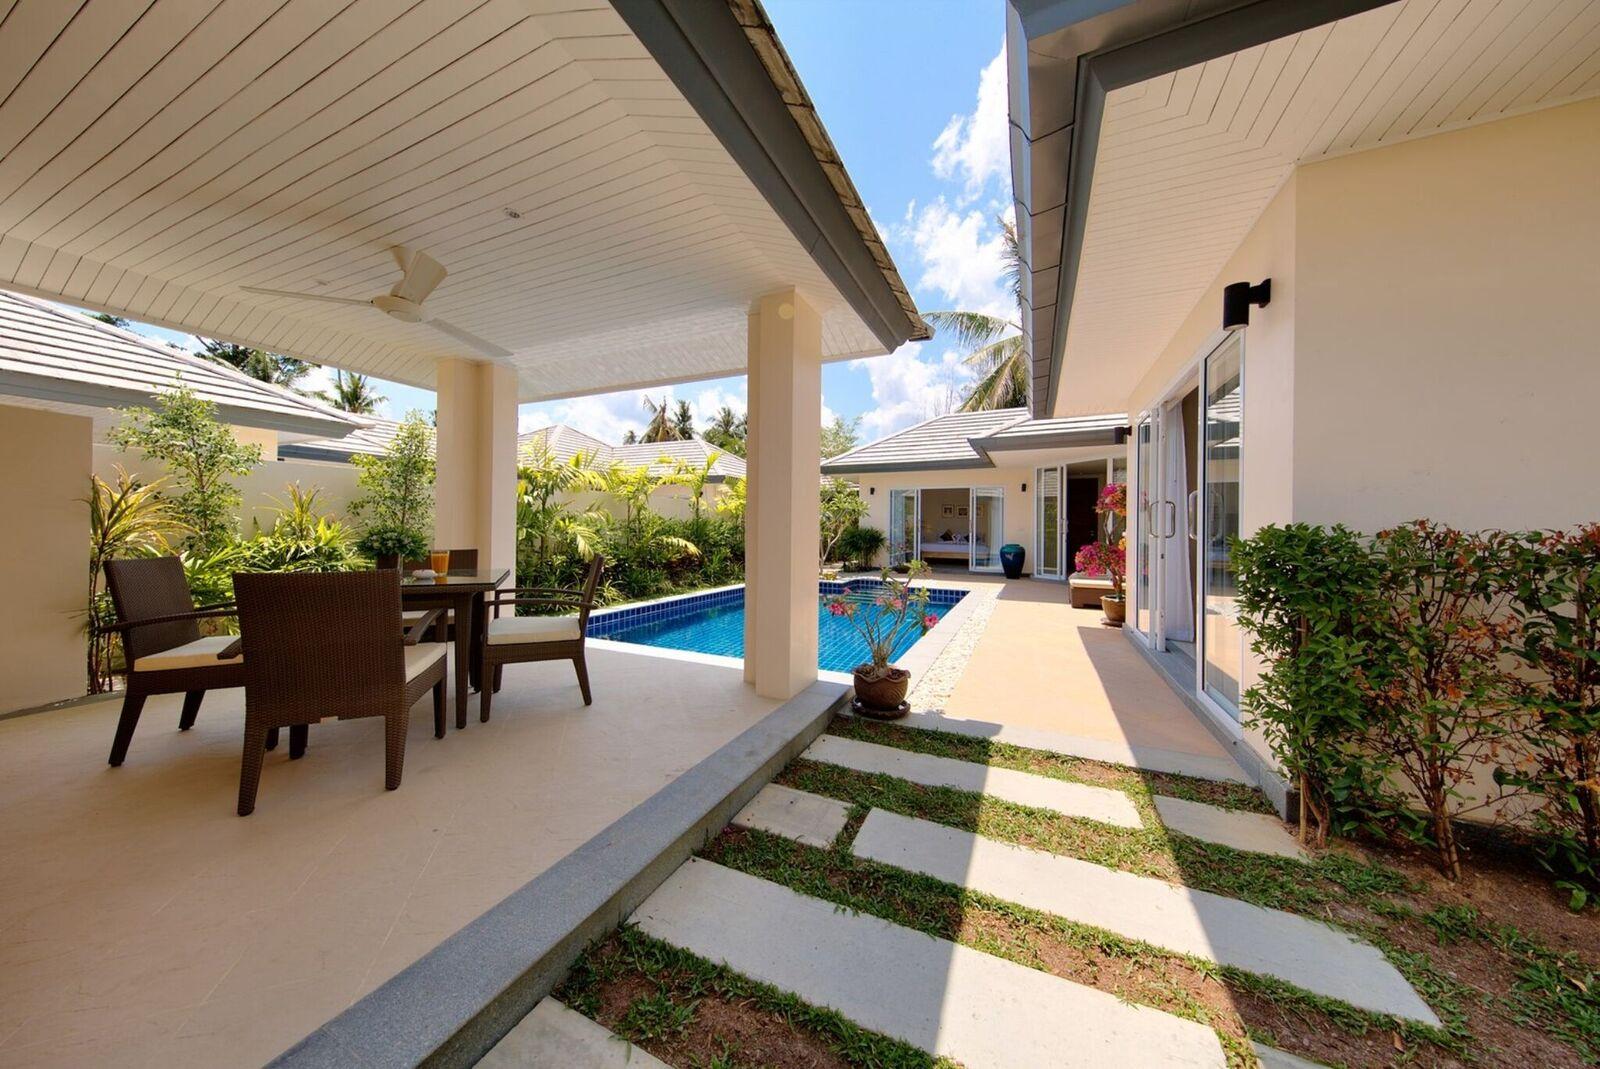 2 Bedroom Garden View Villa with Private Pool at Lipa Noi Ko Samui